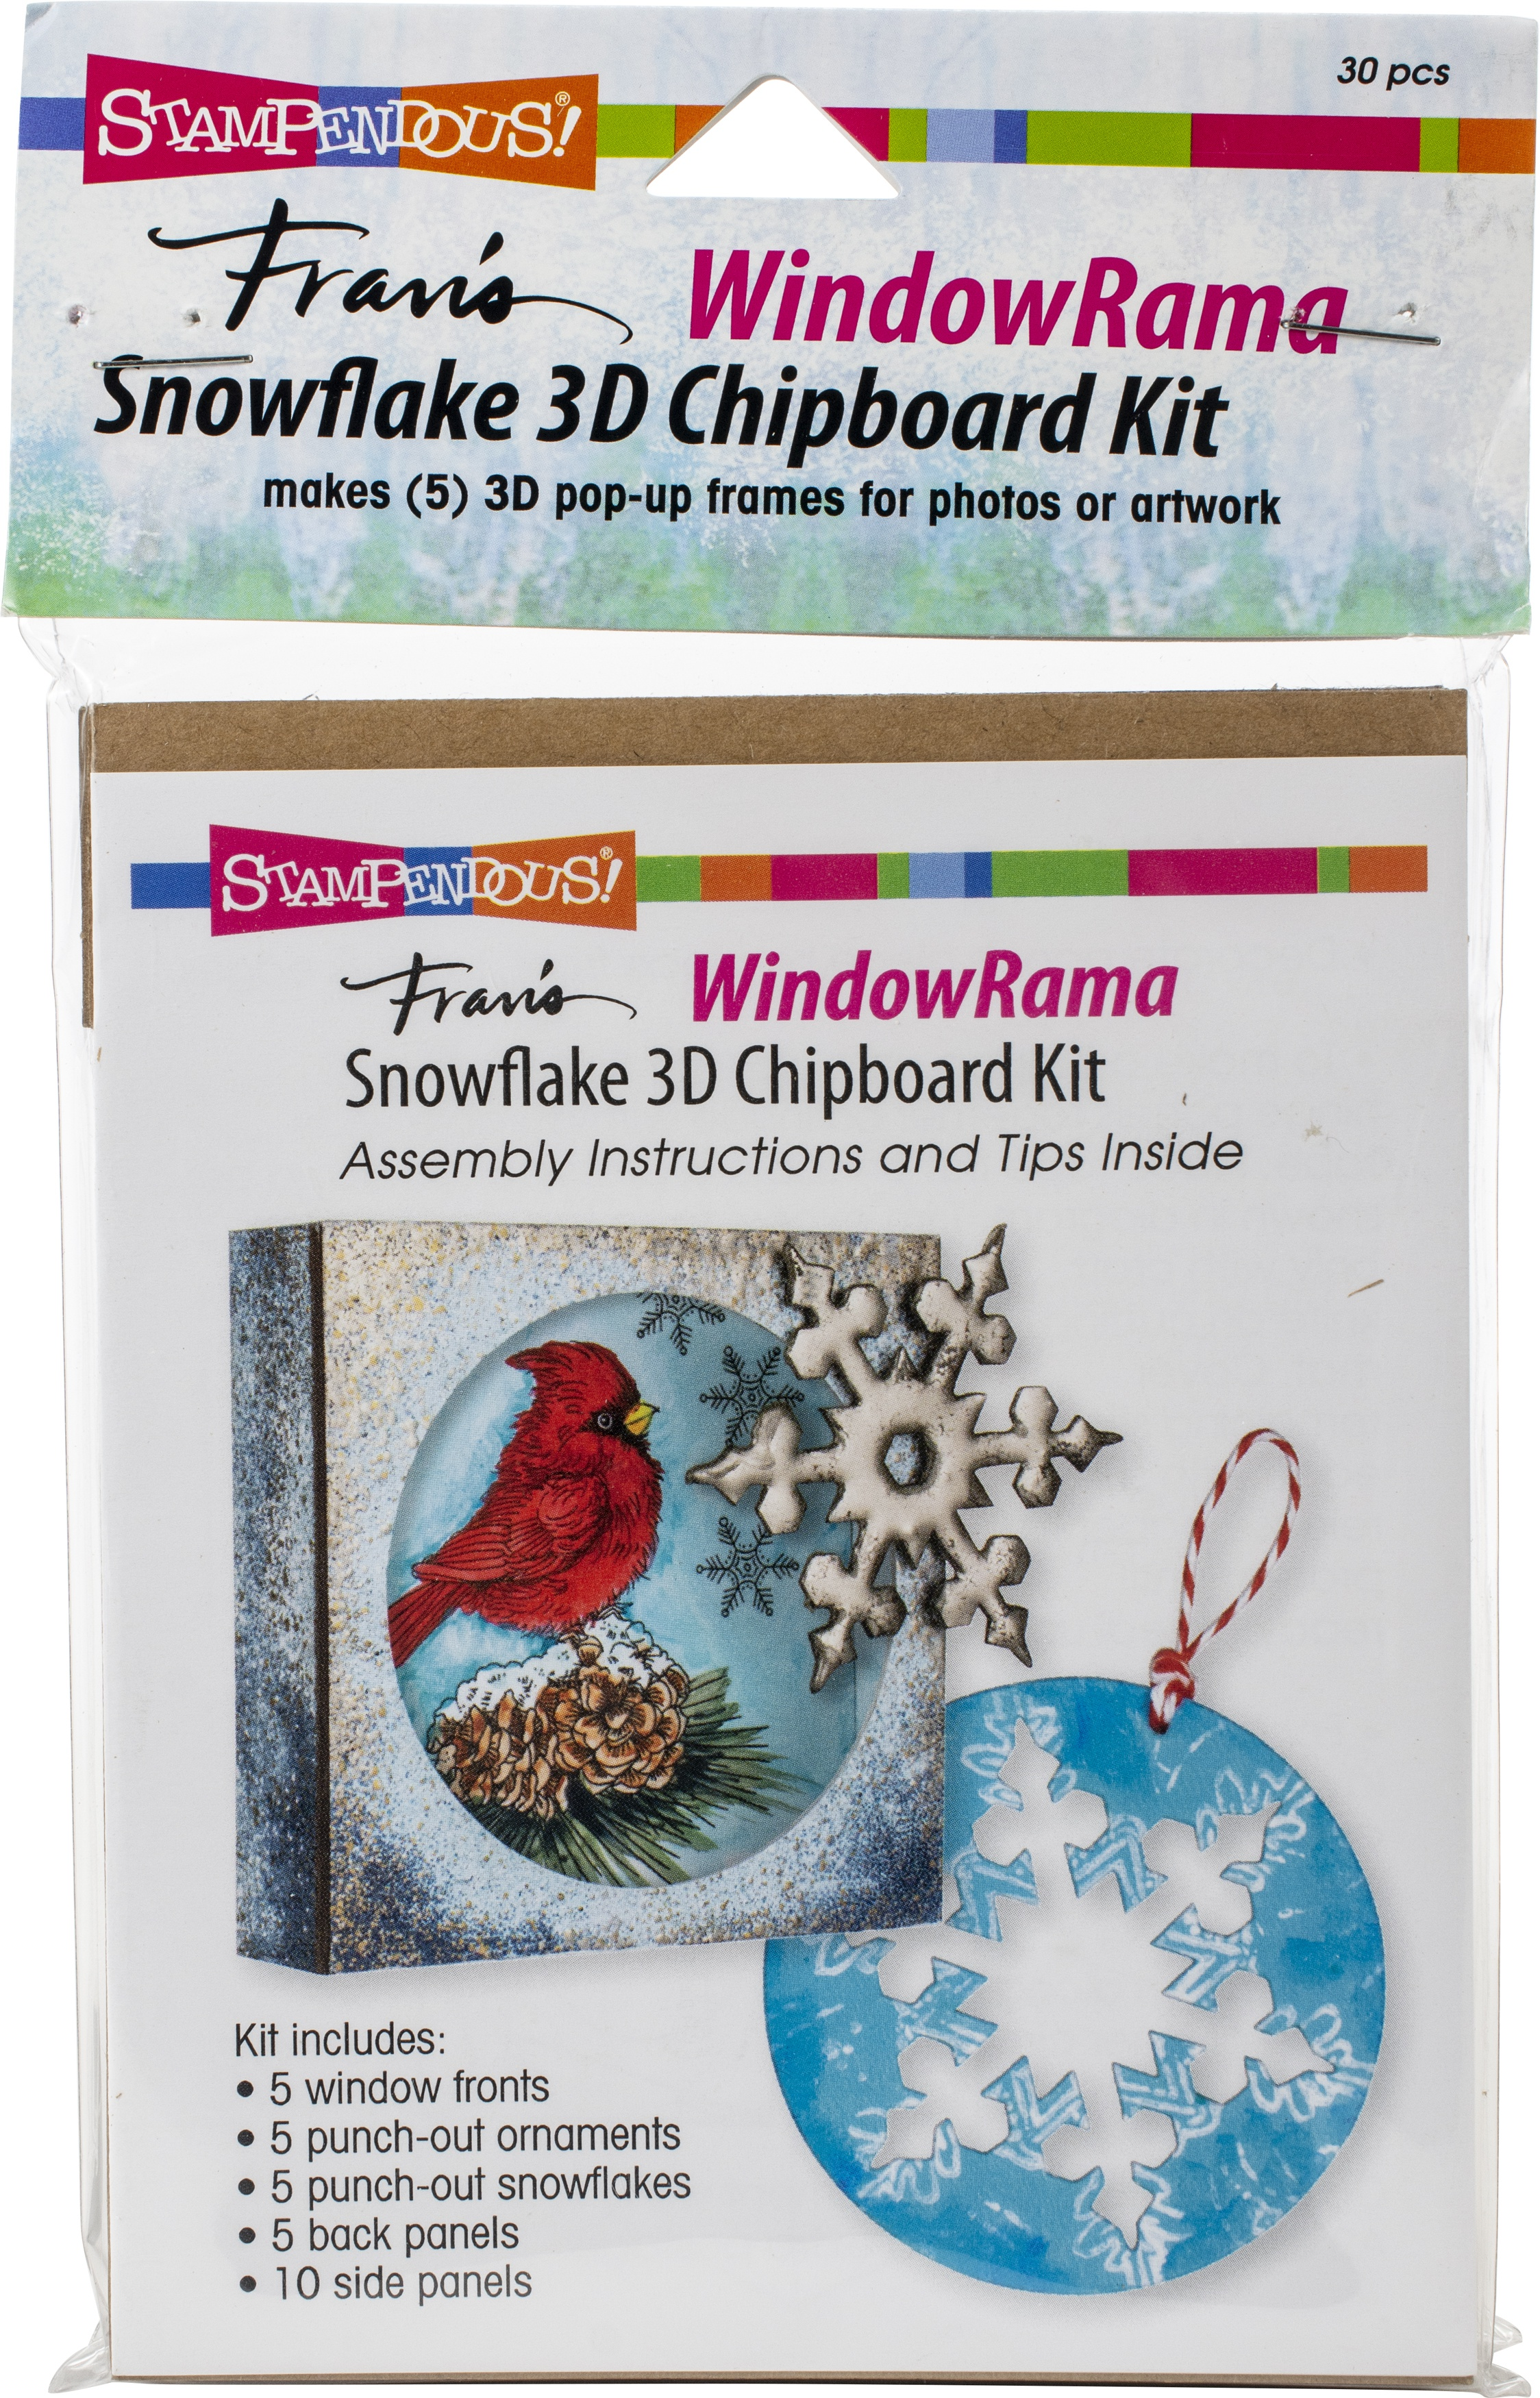 Stampendous Windowrama 3D Chipboard Kit-Snowflake